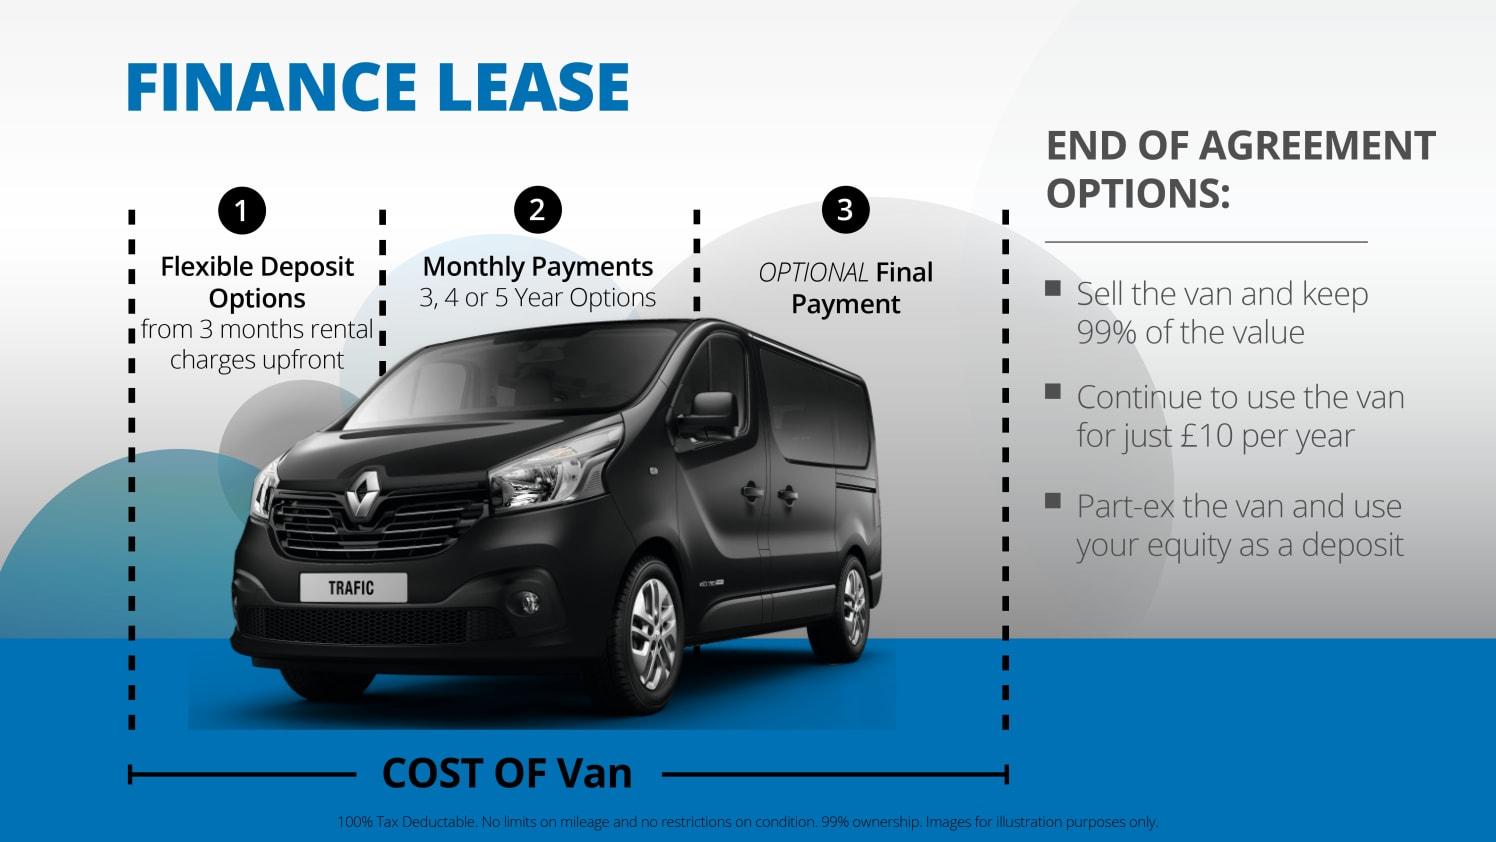 Van Finance Lease listing image